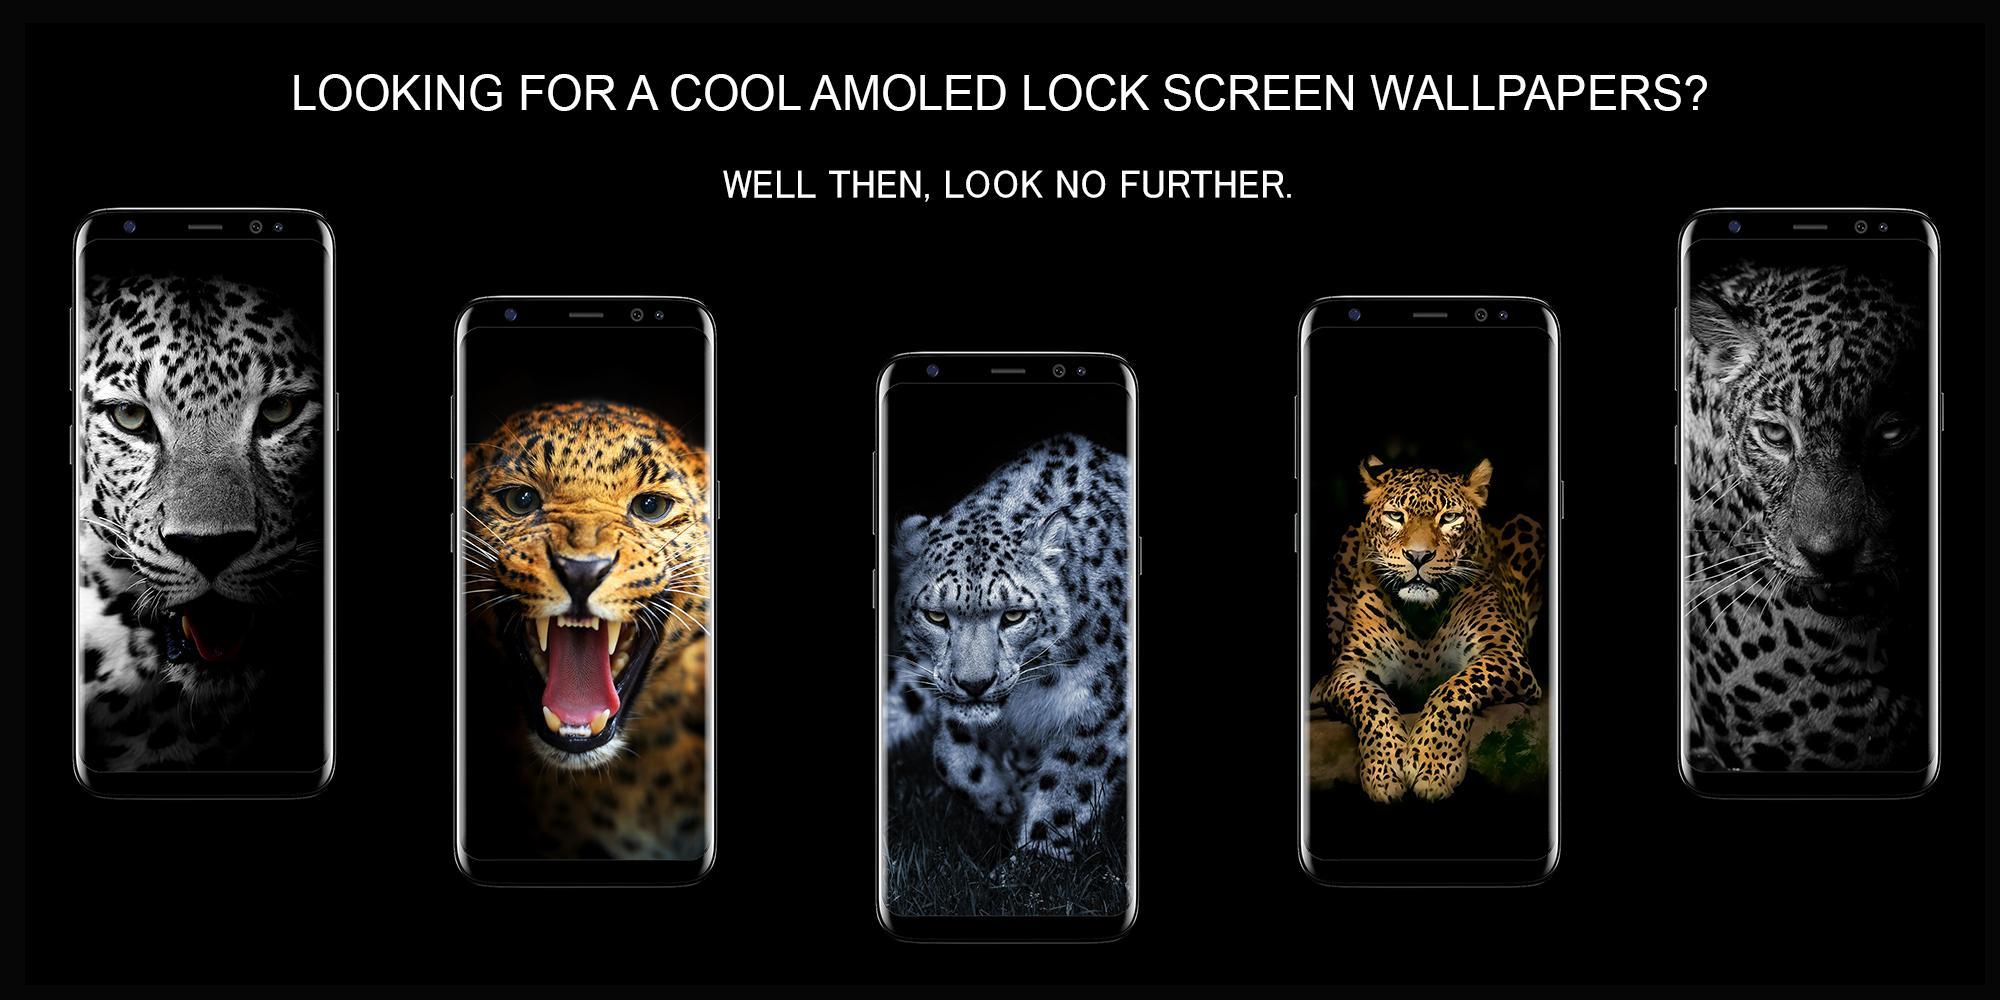 Leopard Dark Black Amoled Lock Screen Wallpaper For Android Apk